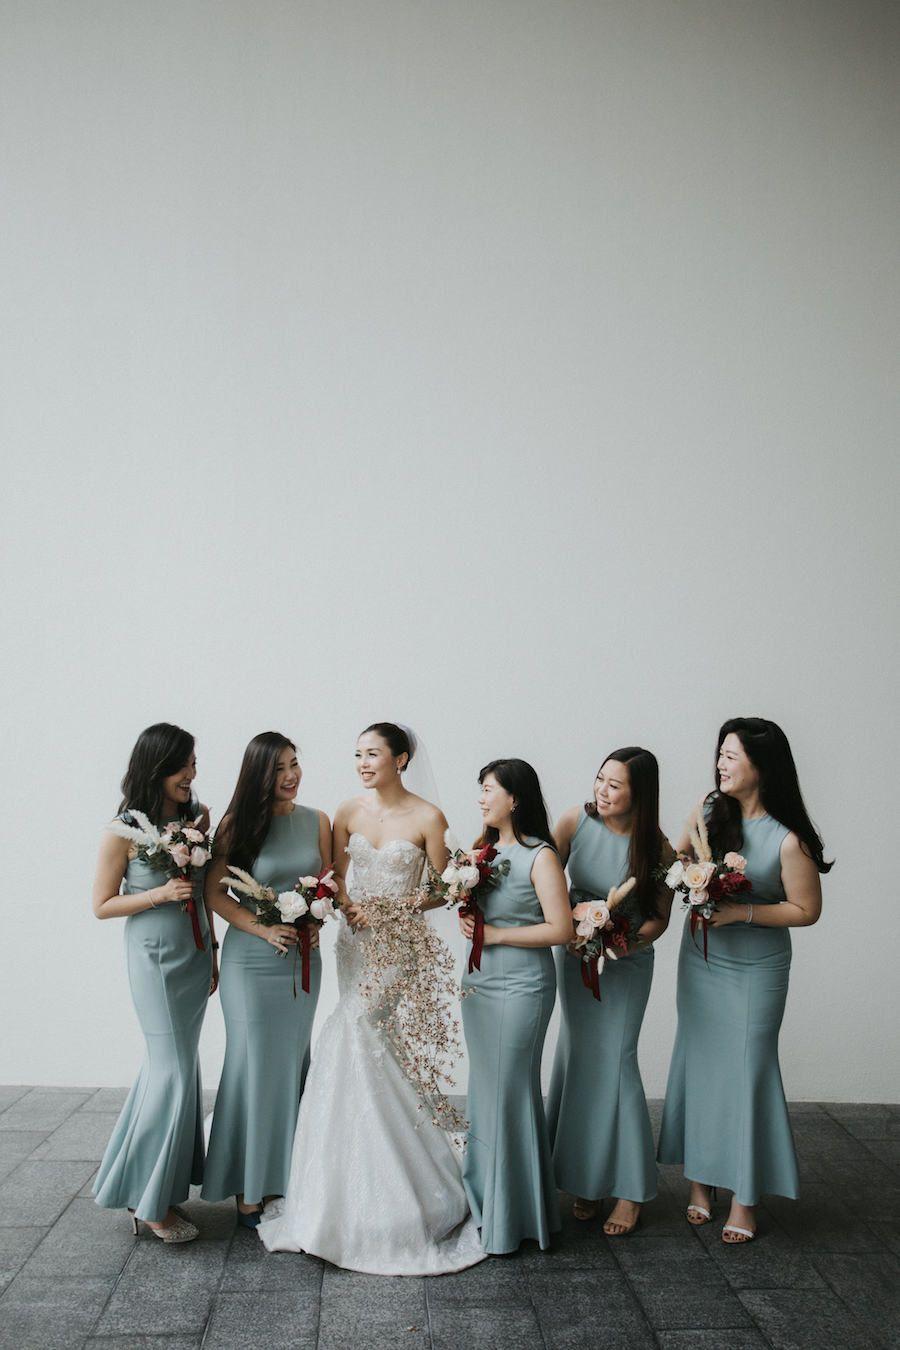 Sophisticated Chic Singapore Wedding With Classic Details Modwedding Wedding Entourage Gowns Bridesmaid Dresses Singapore Wedding Entourage [ 1350 x 900 Pixel ]